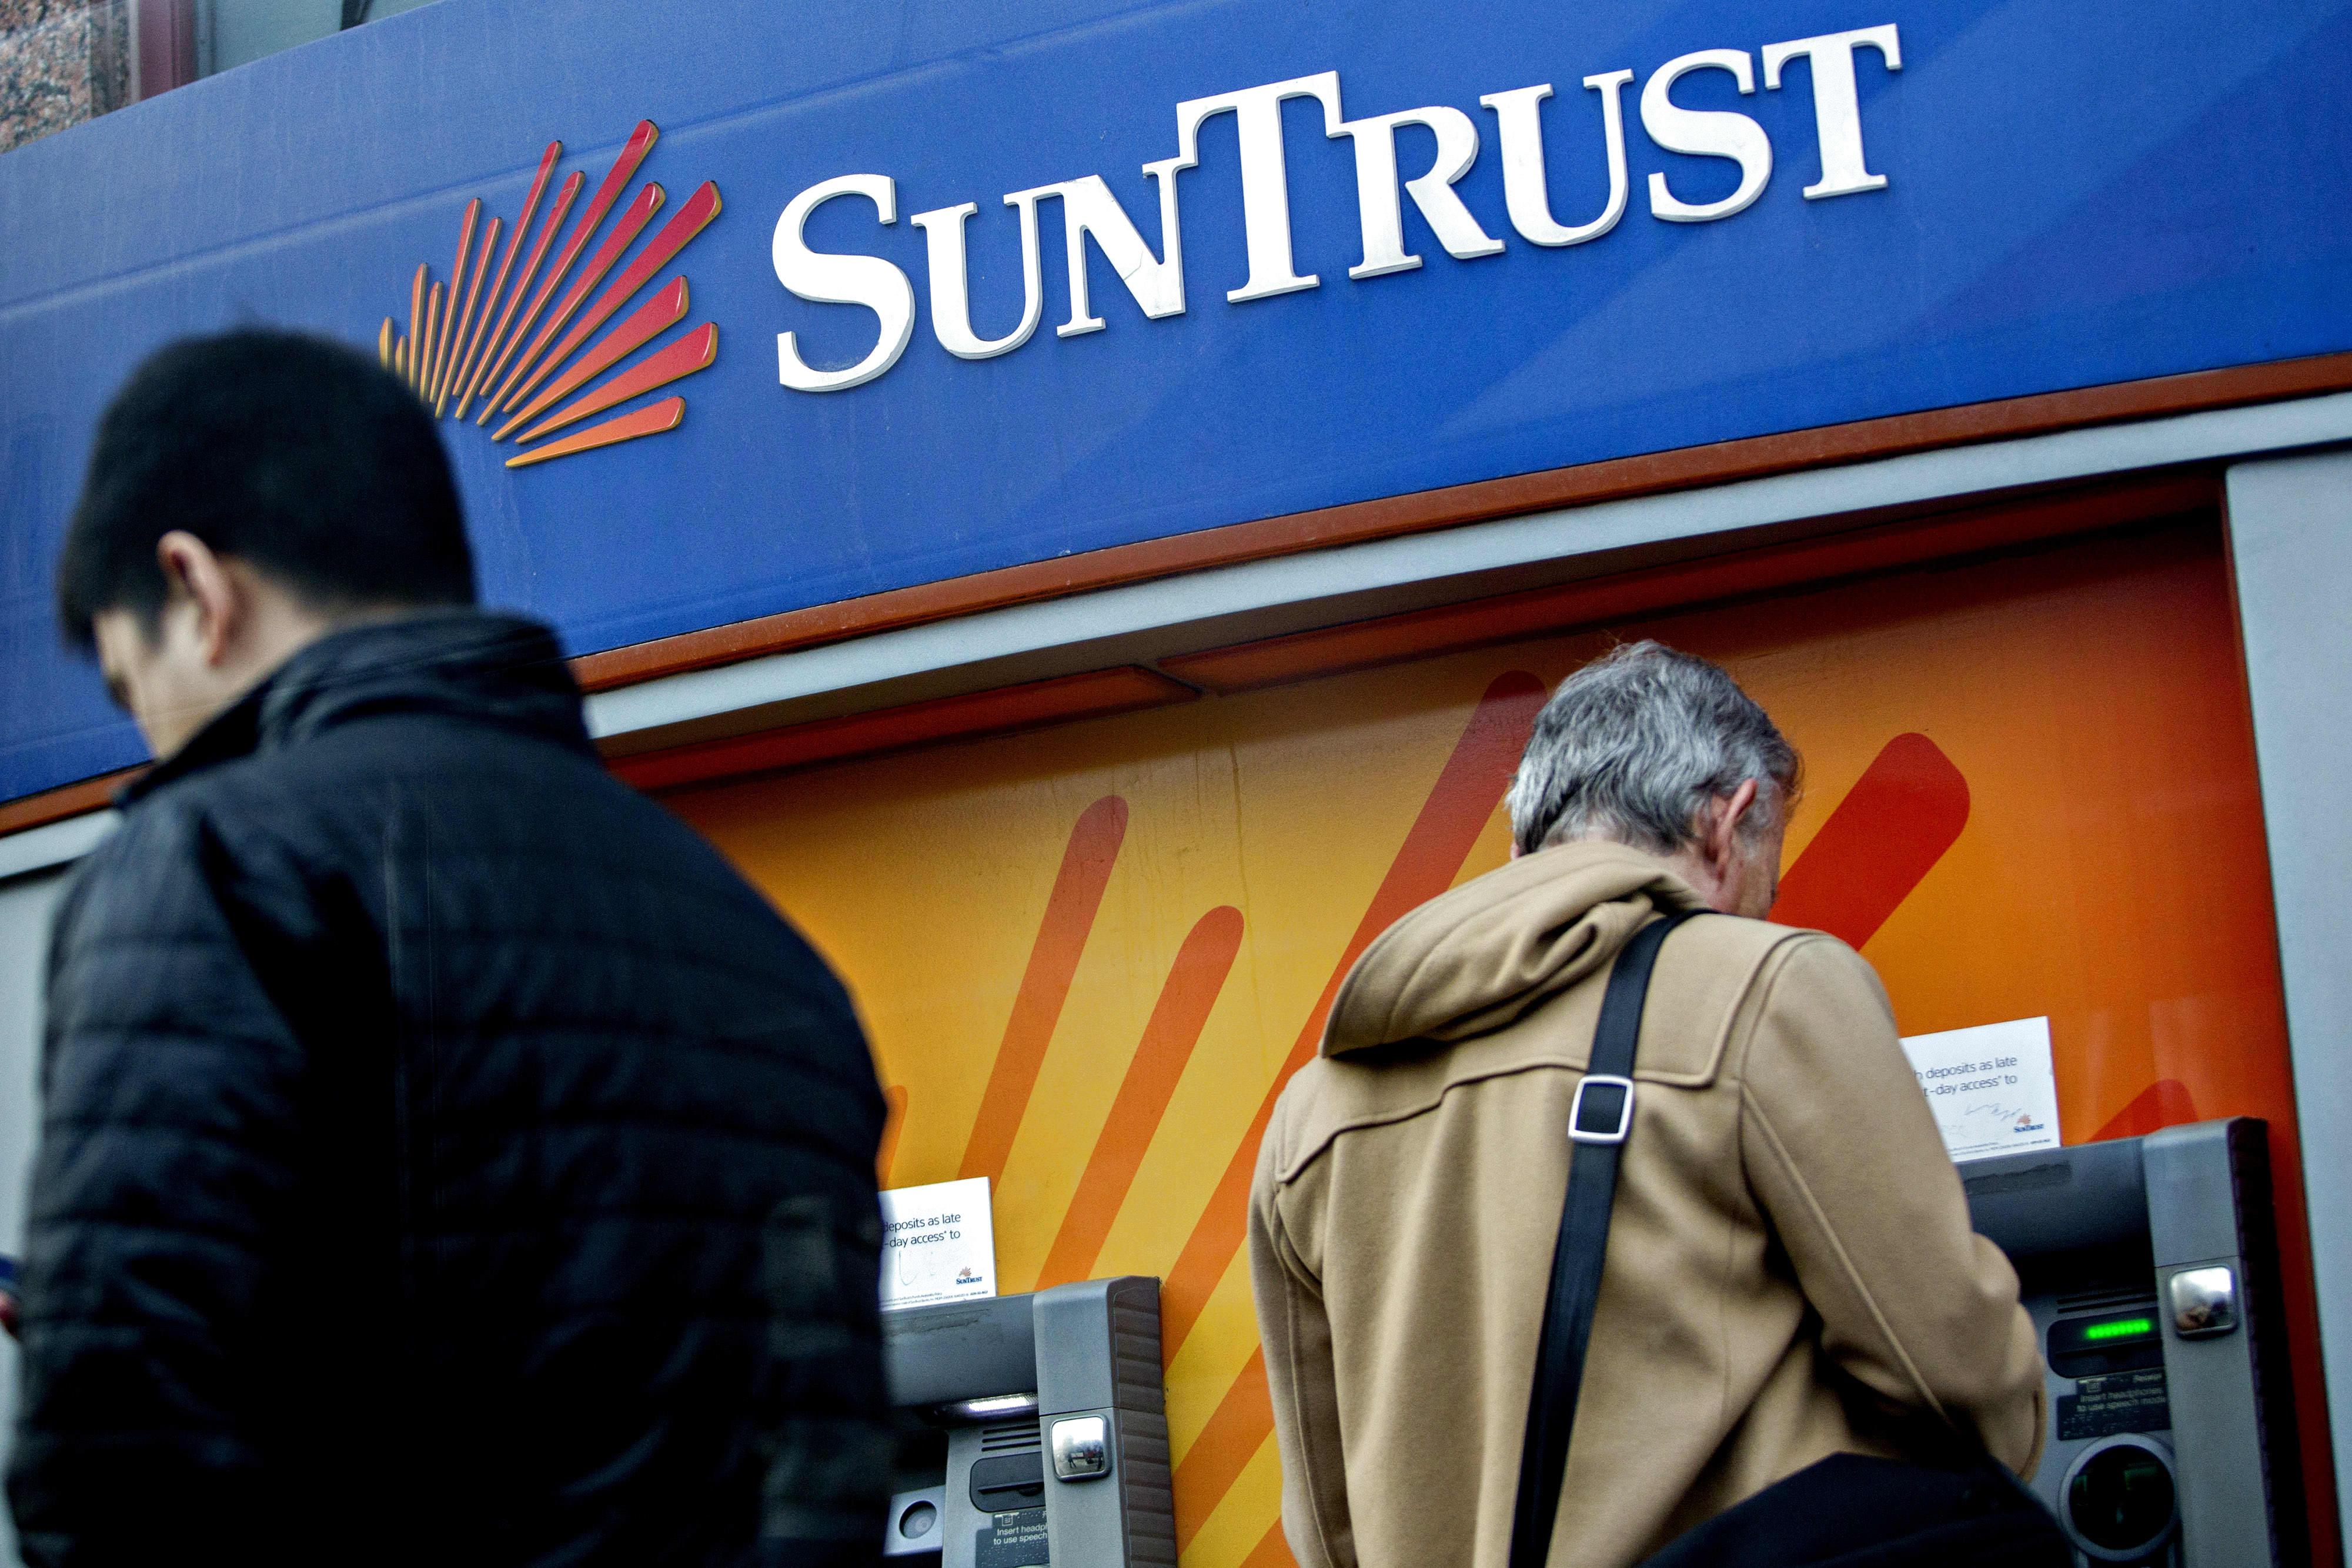 Suntrust, BB&T merger a product of technology on Wall Street